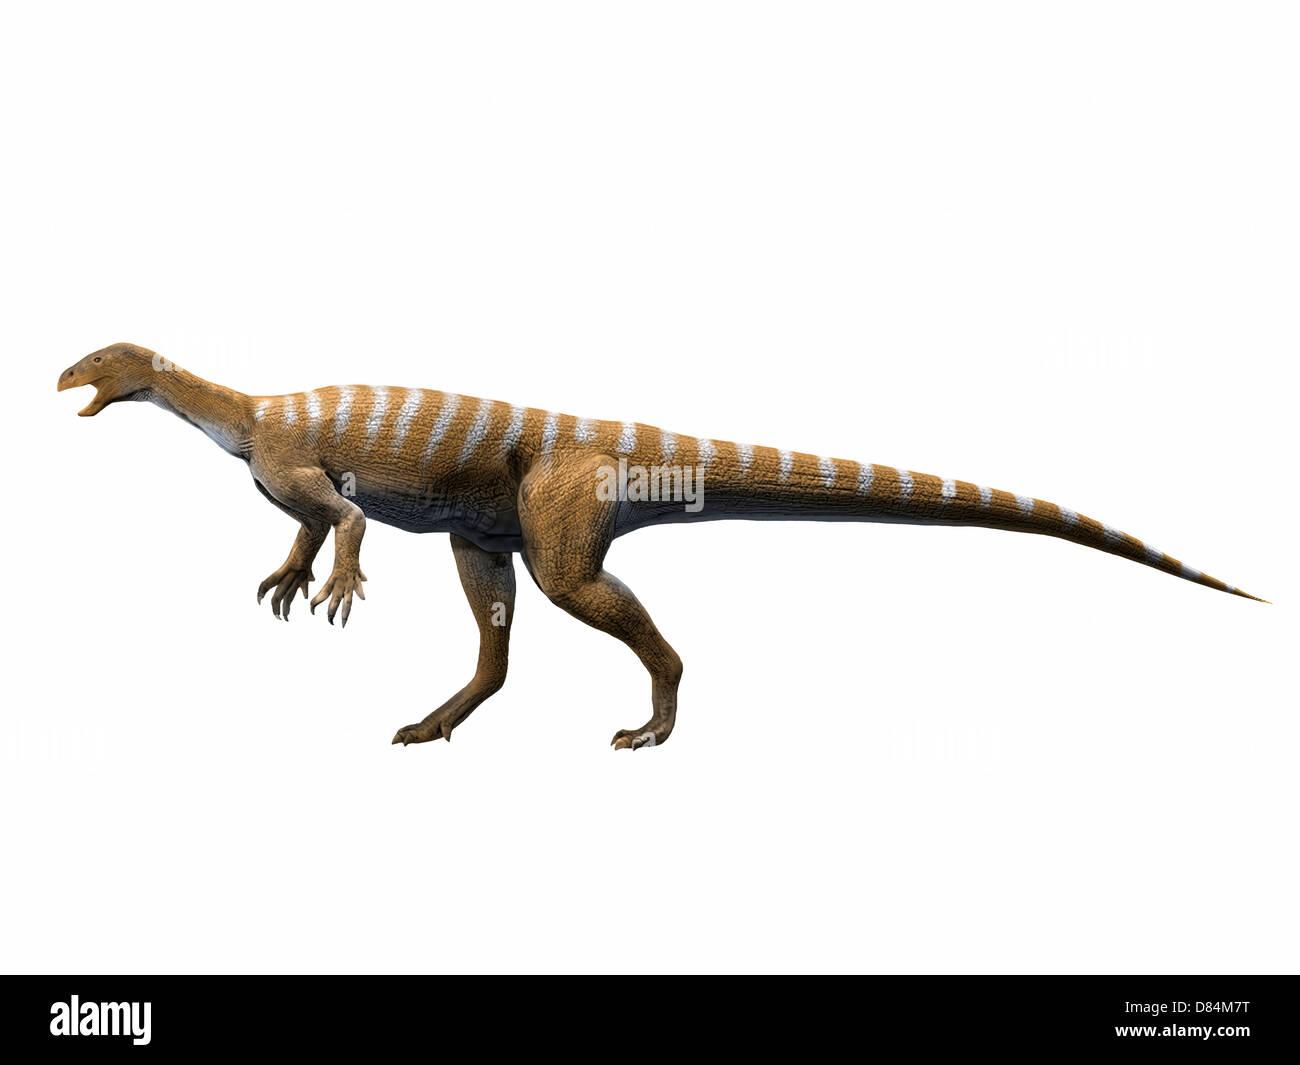 Thecodontosaurus antiquus, Late Triassic of The United Kingdom. - Stock Image